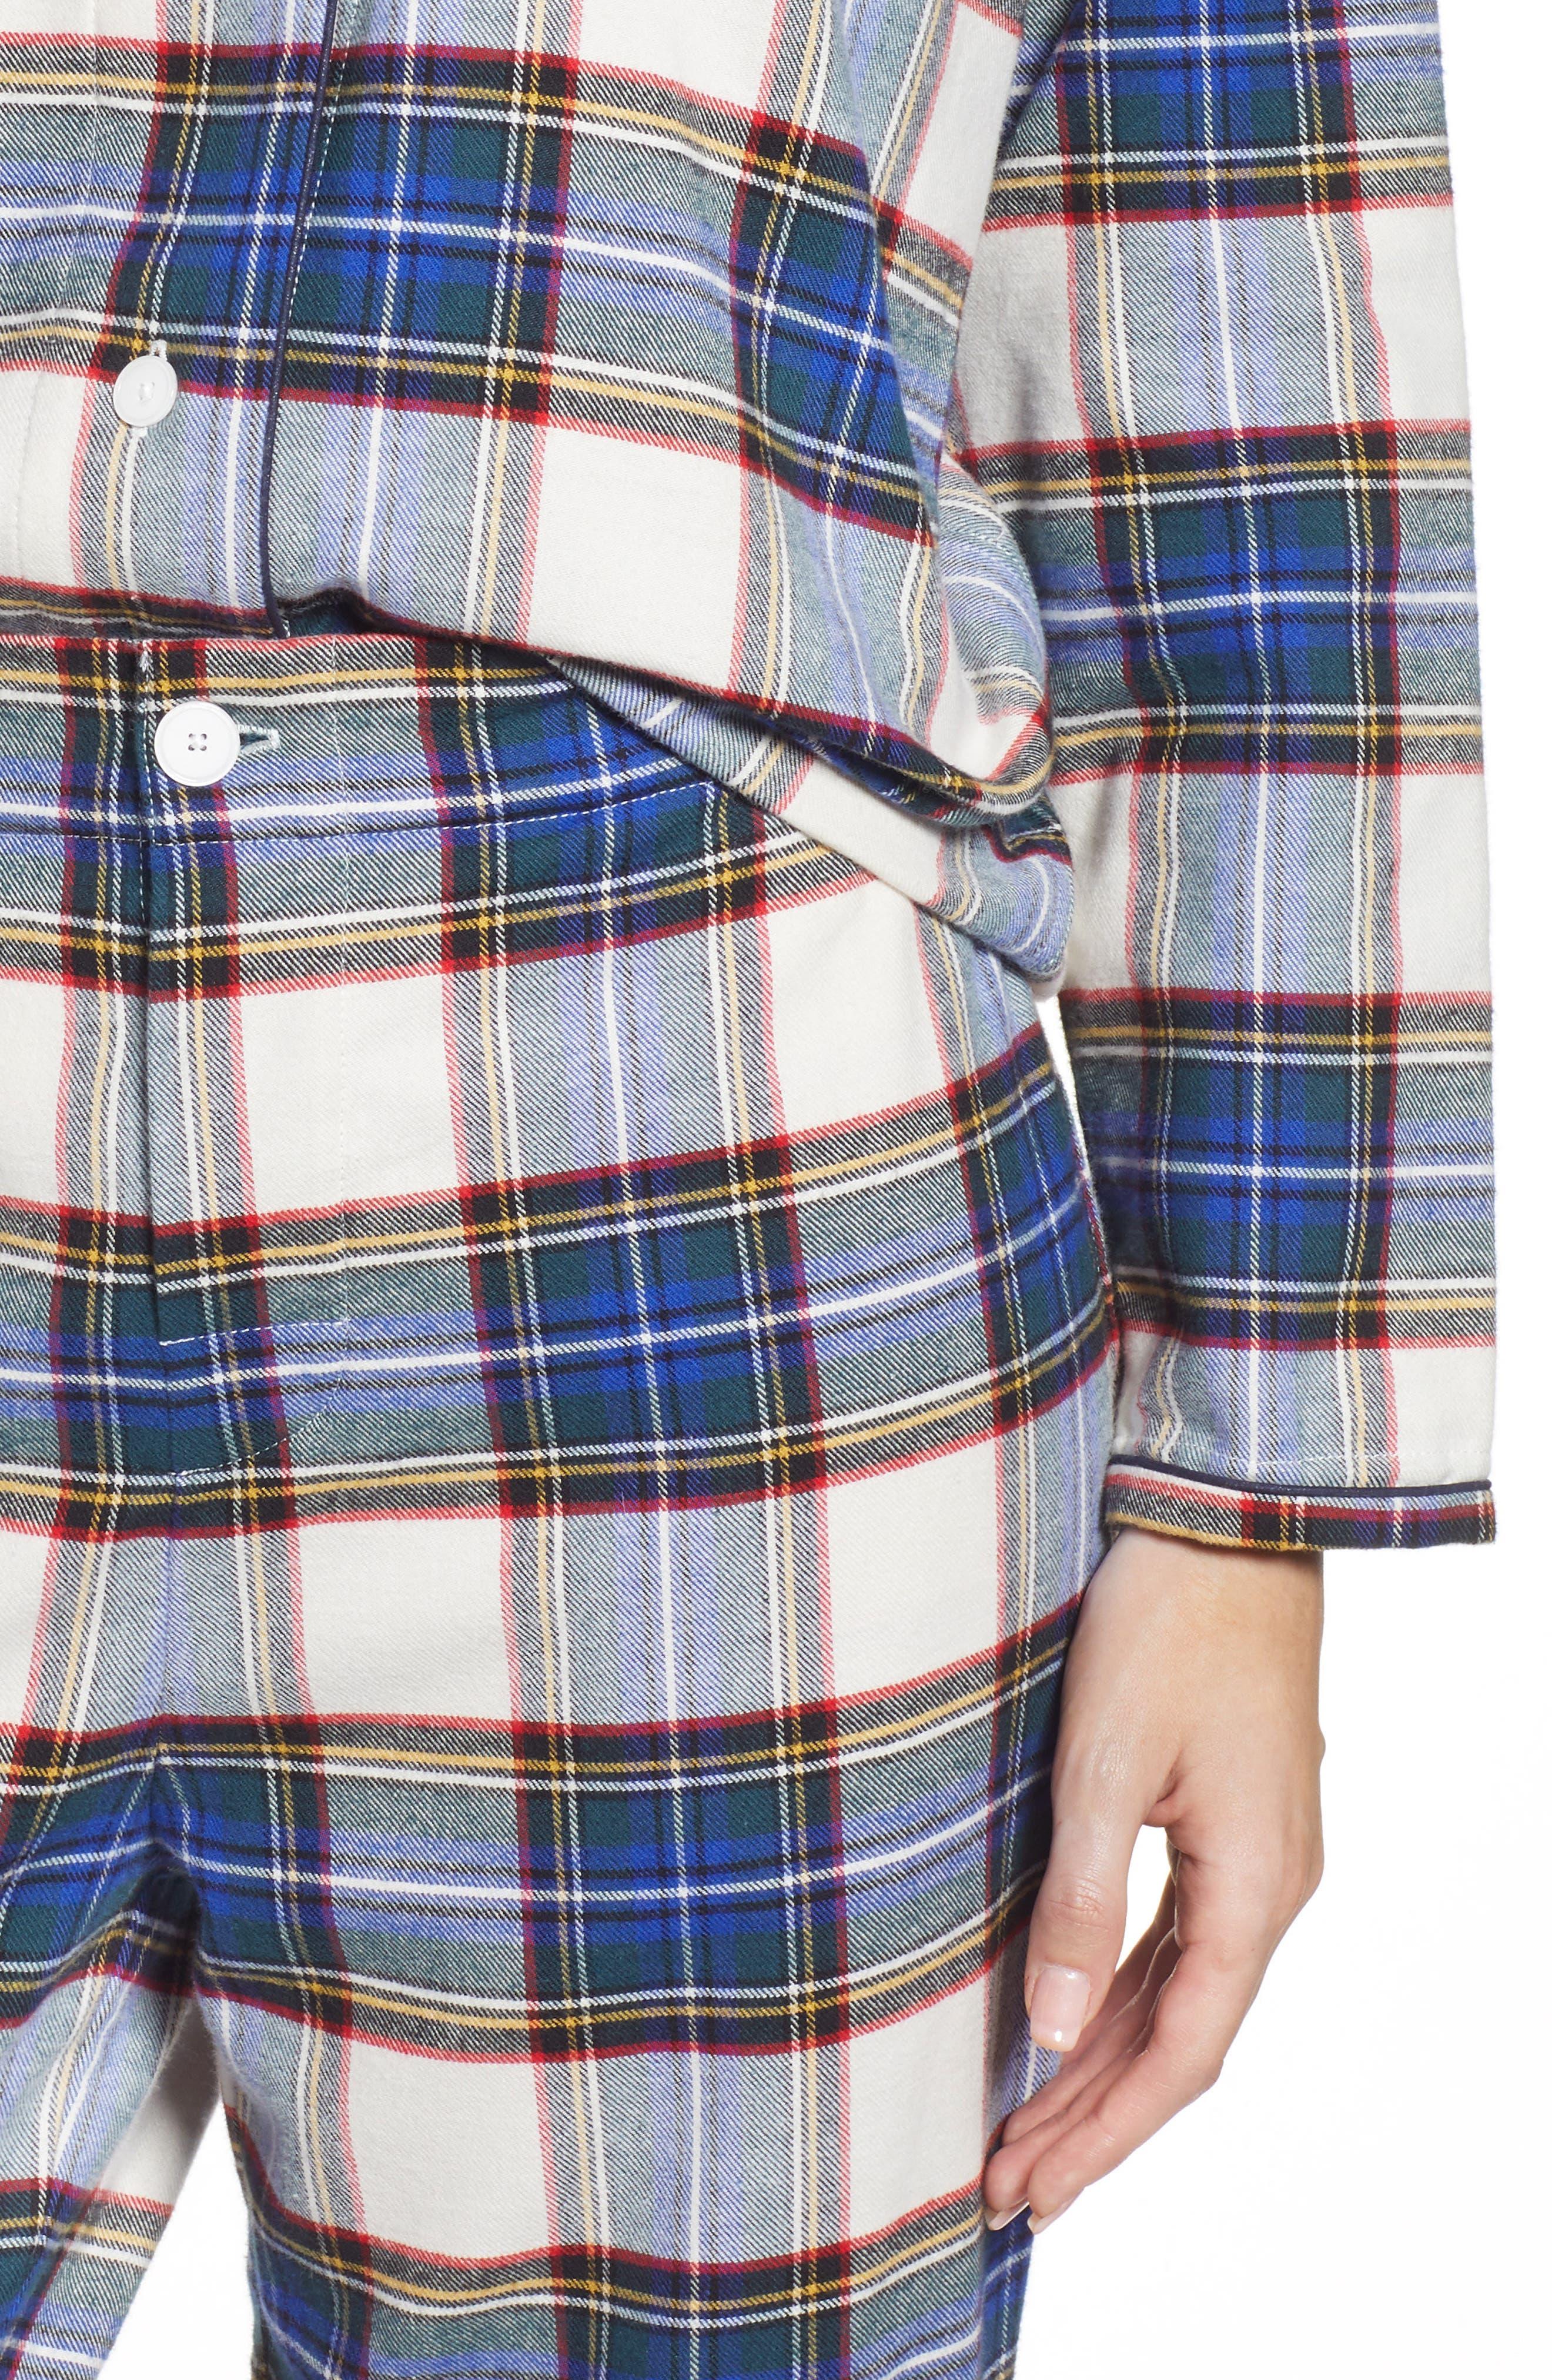 Bishop Women's Pajamas,                             Alternate thumbnail 4, color,                             FLANNEL PLAID